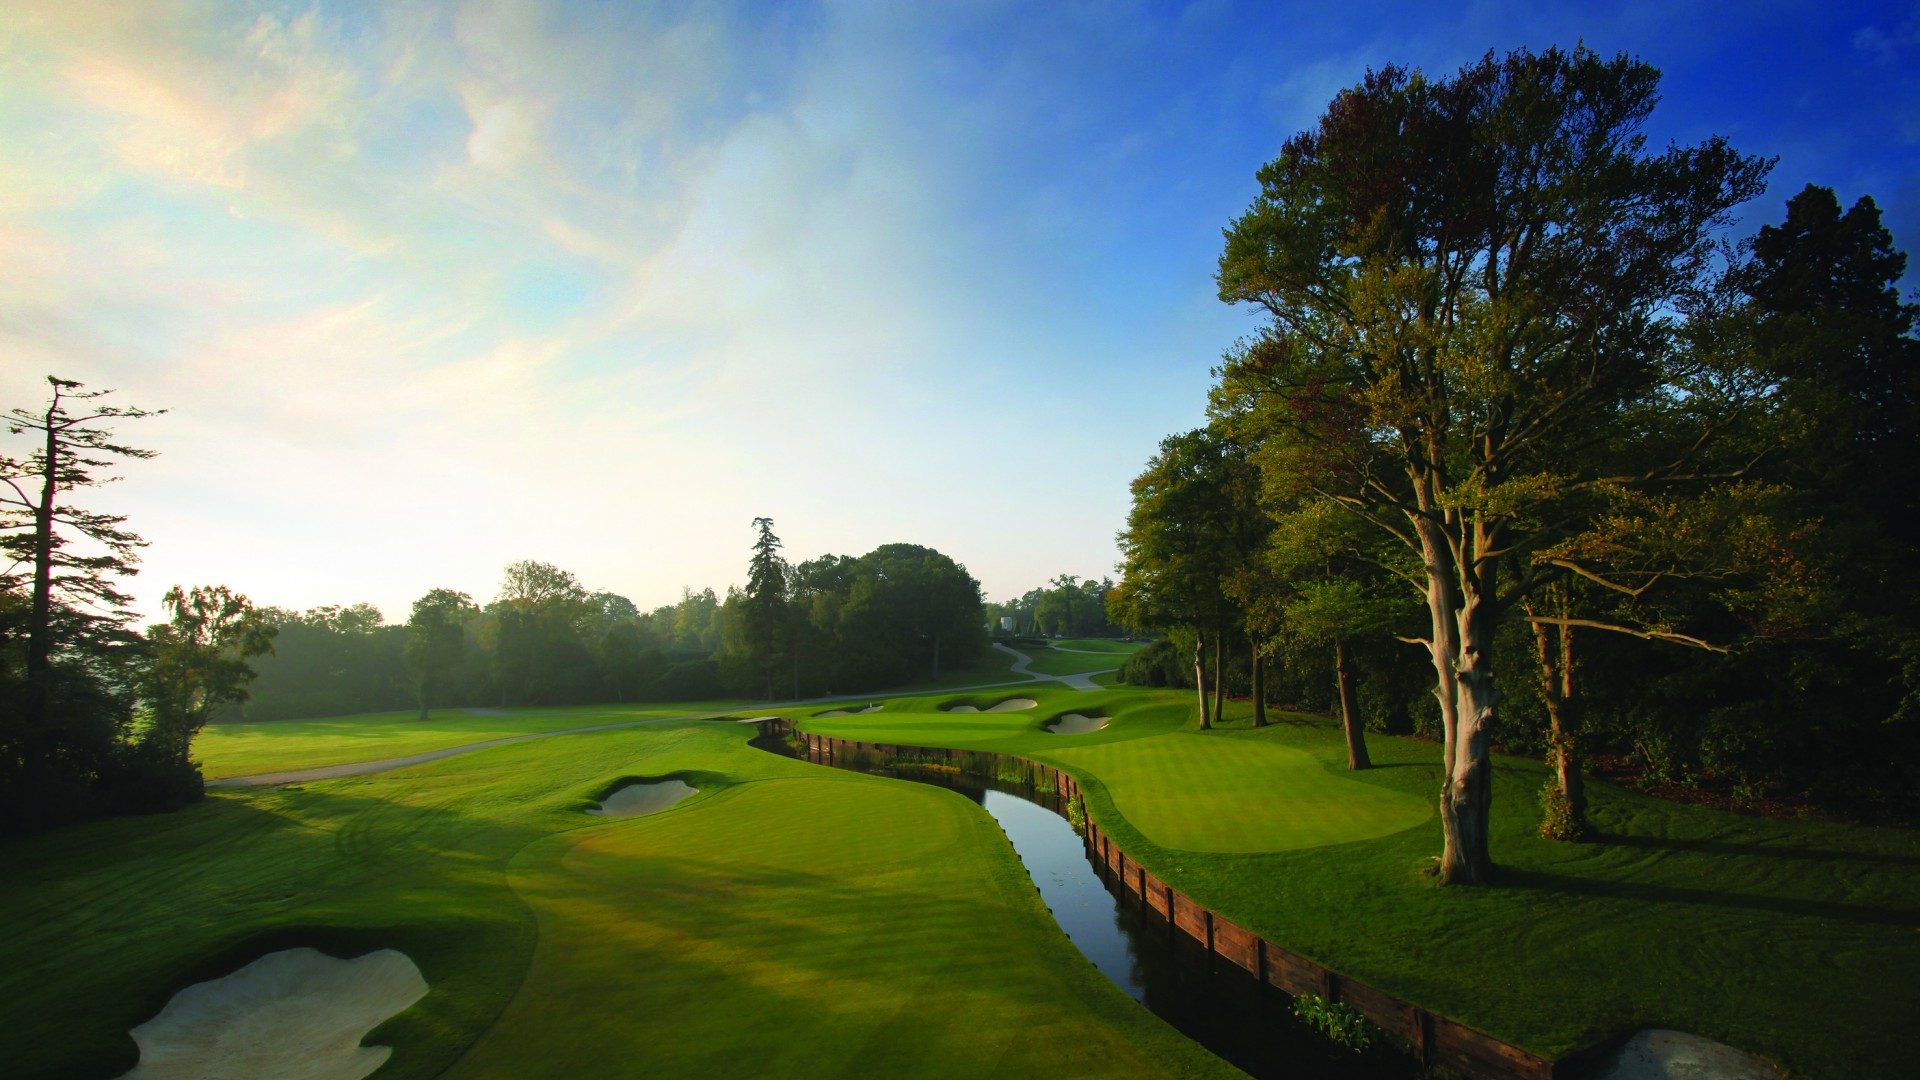 Wentworth Golf Club, The West course, Surrey, England